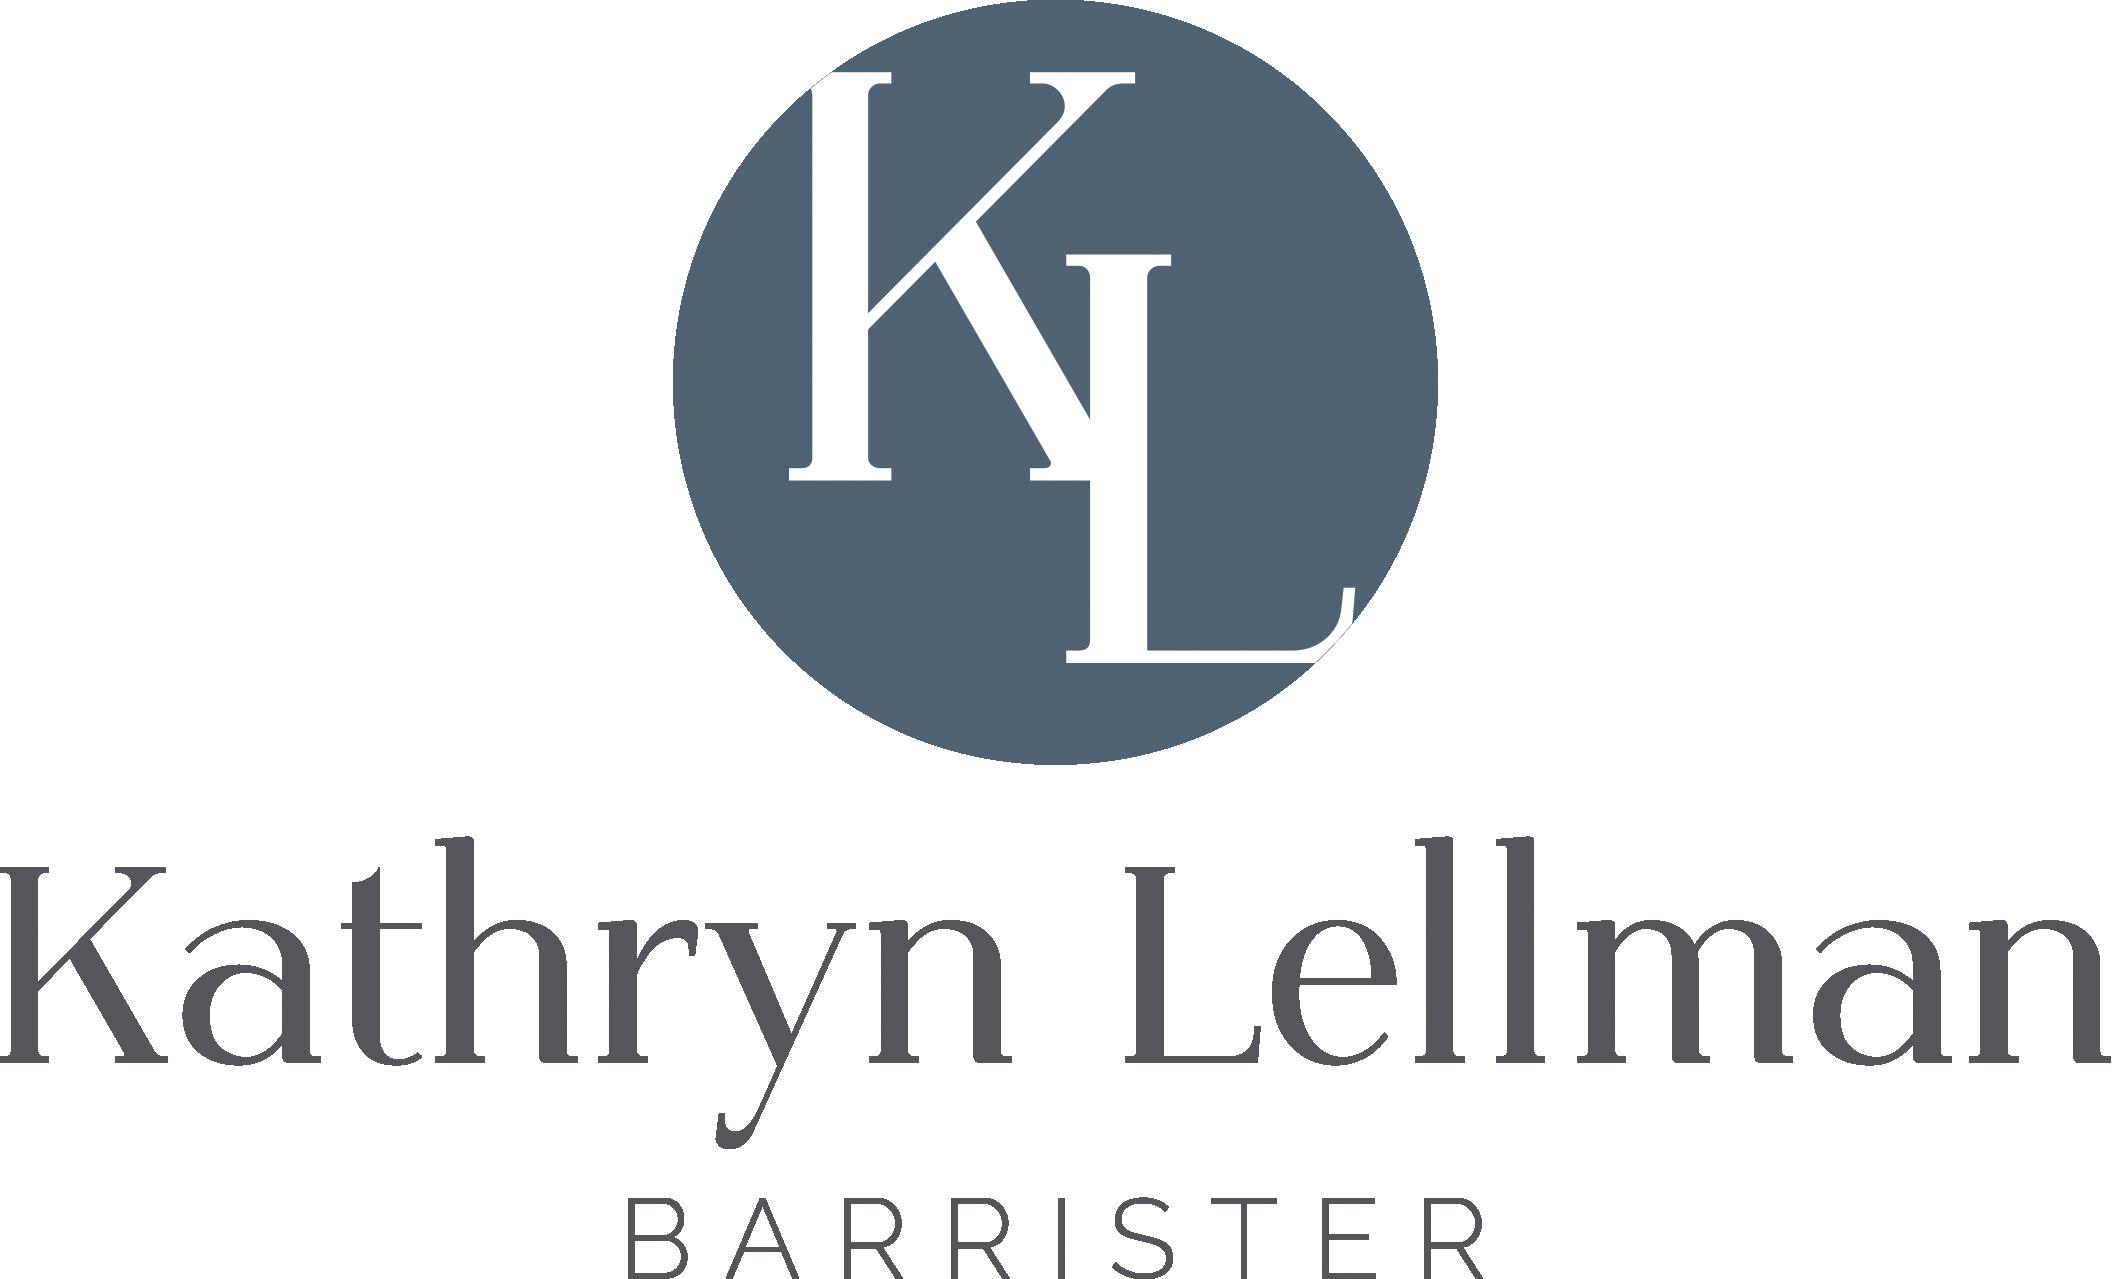 Kathryn Lellman Barrister